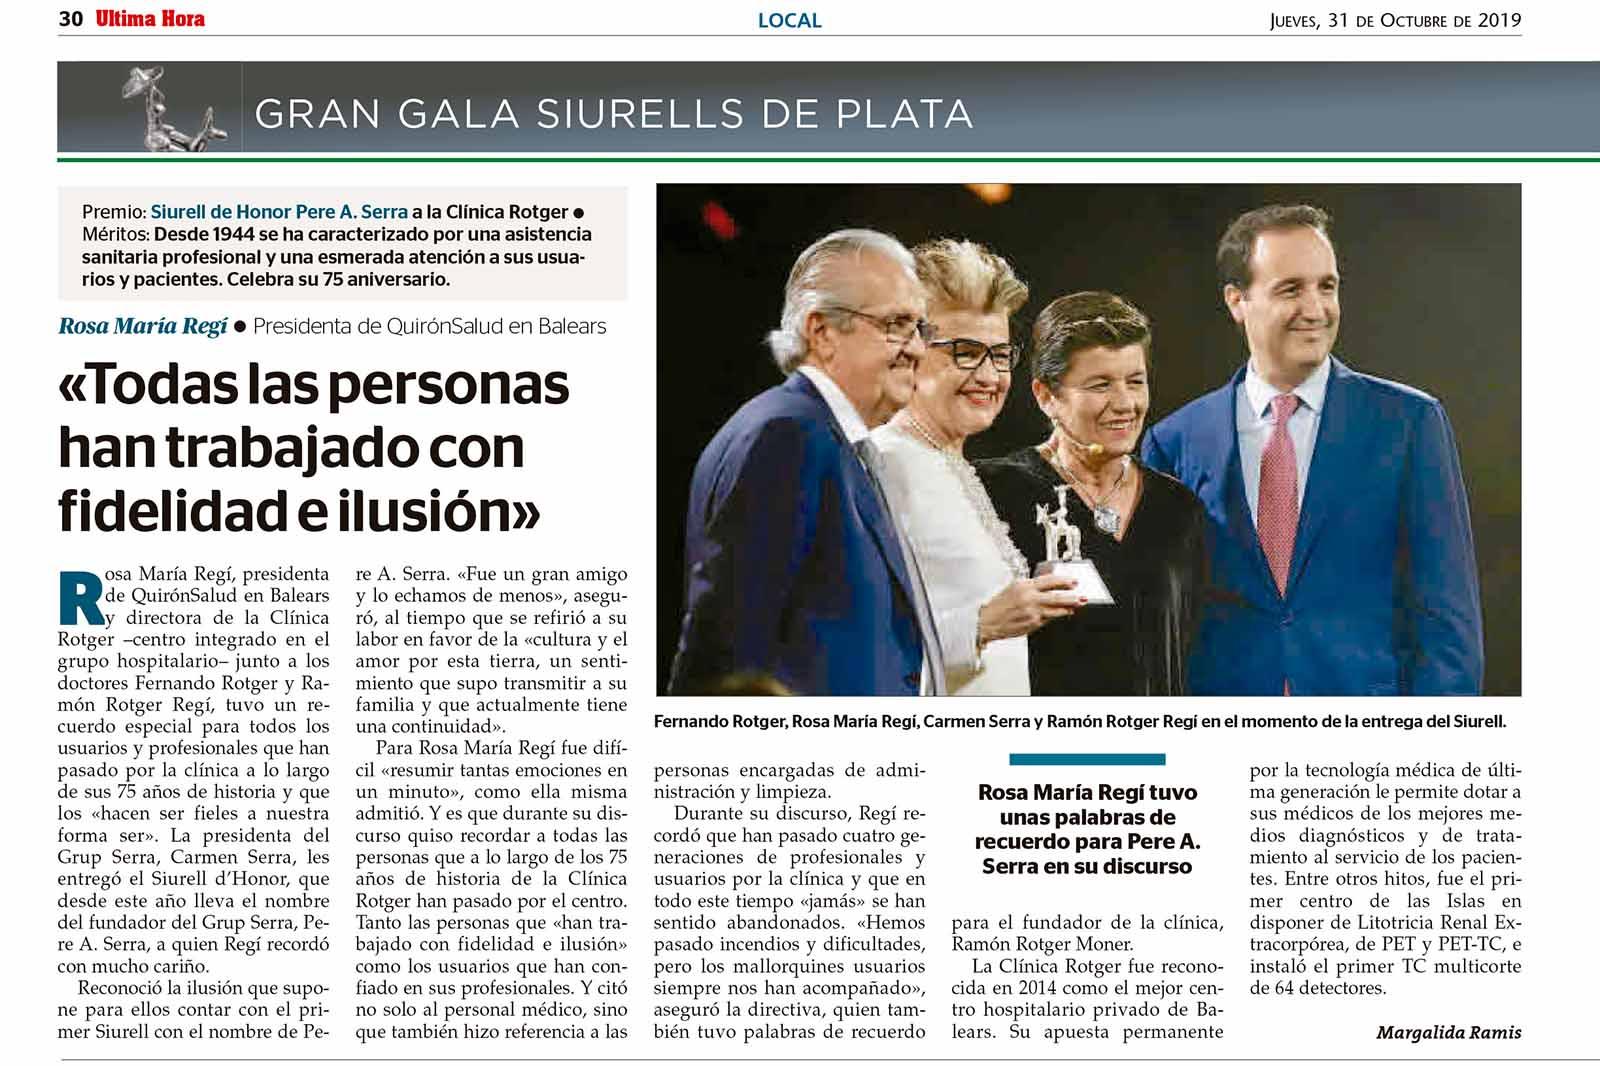 Premios Siurell 2019 – Siurell dHonor a la Clinica Rotger por su 75 aniversario